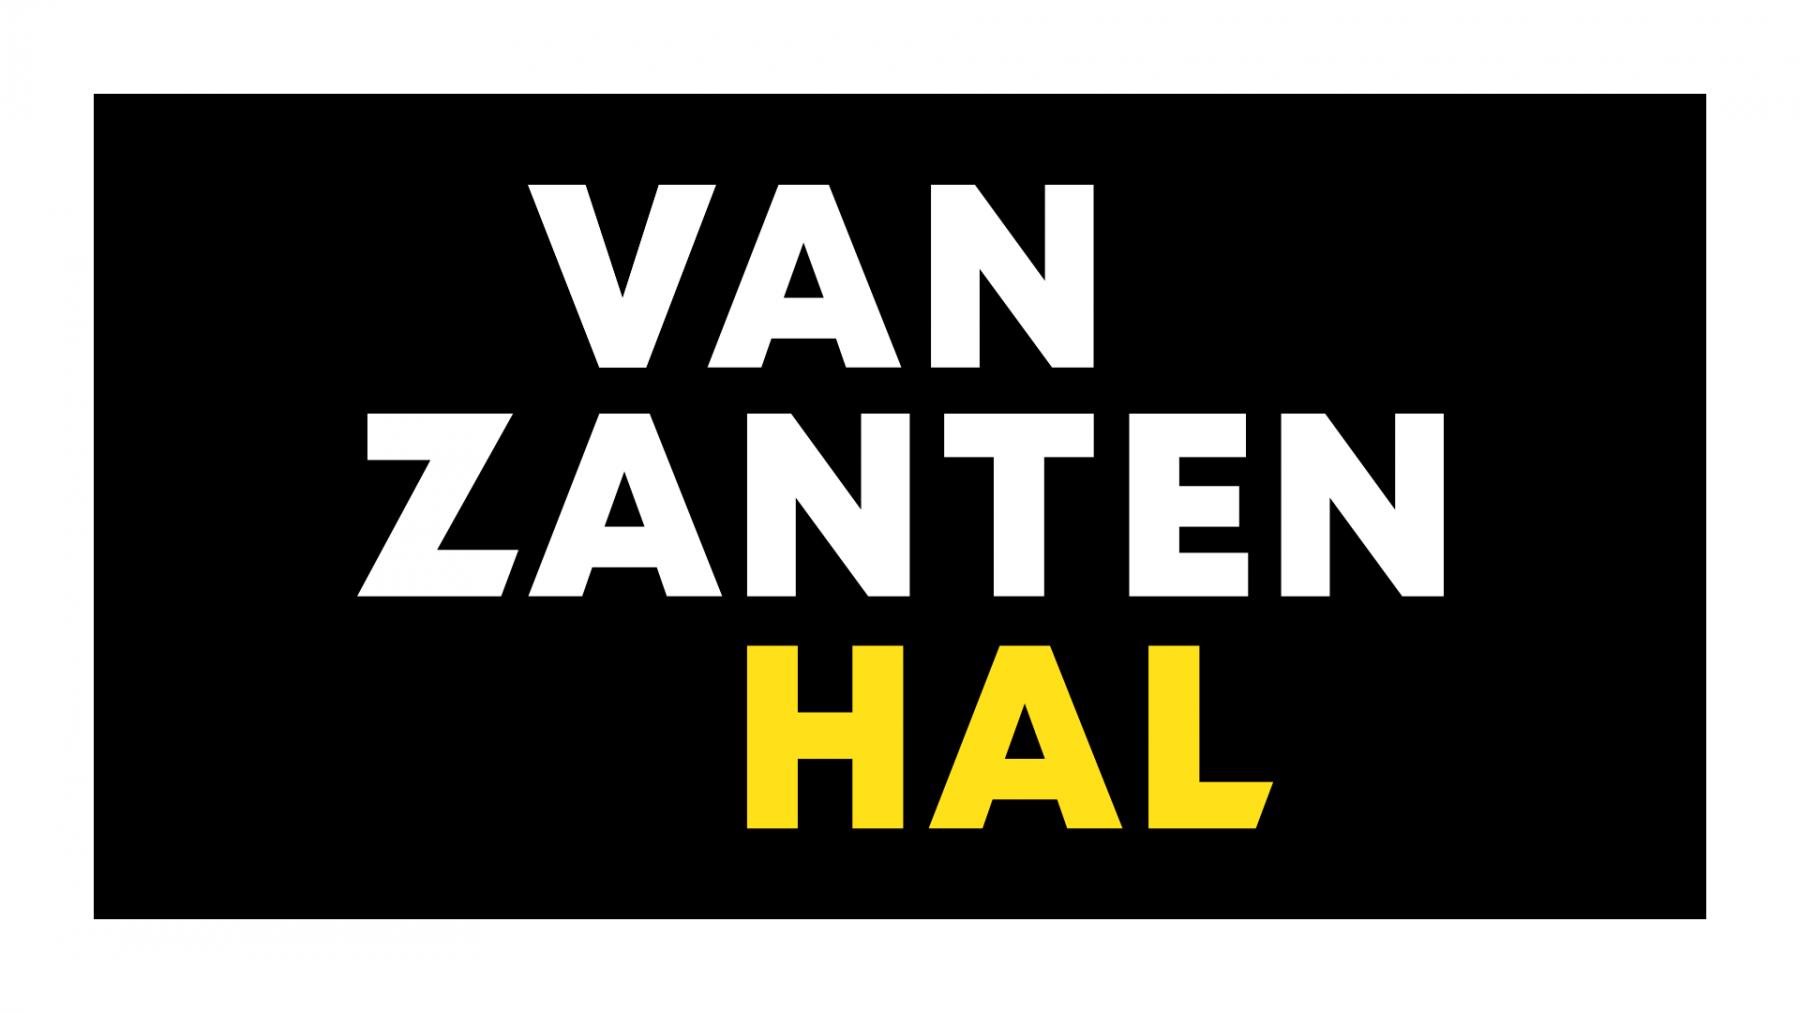 Vanzantenhal.fw_